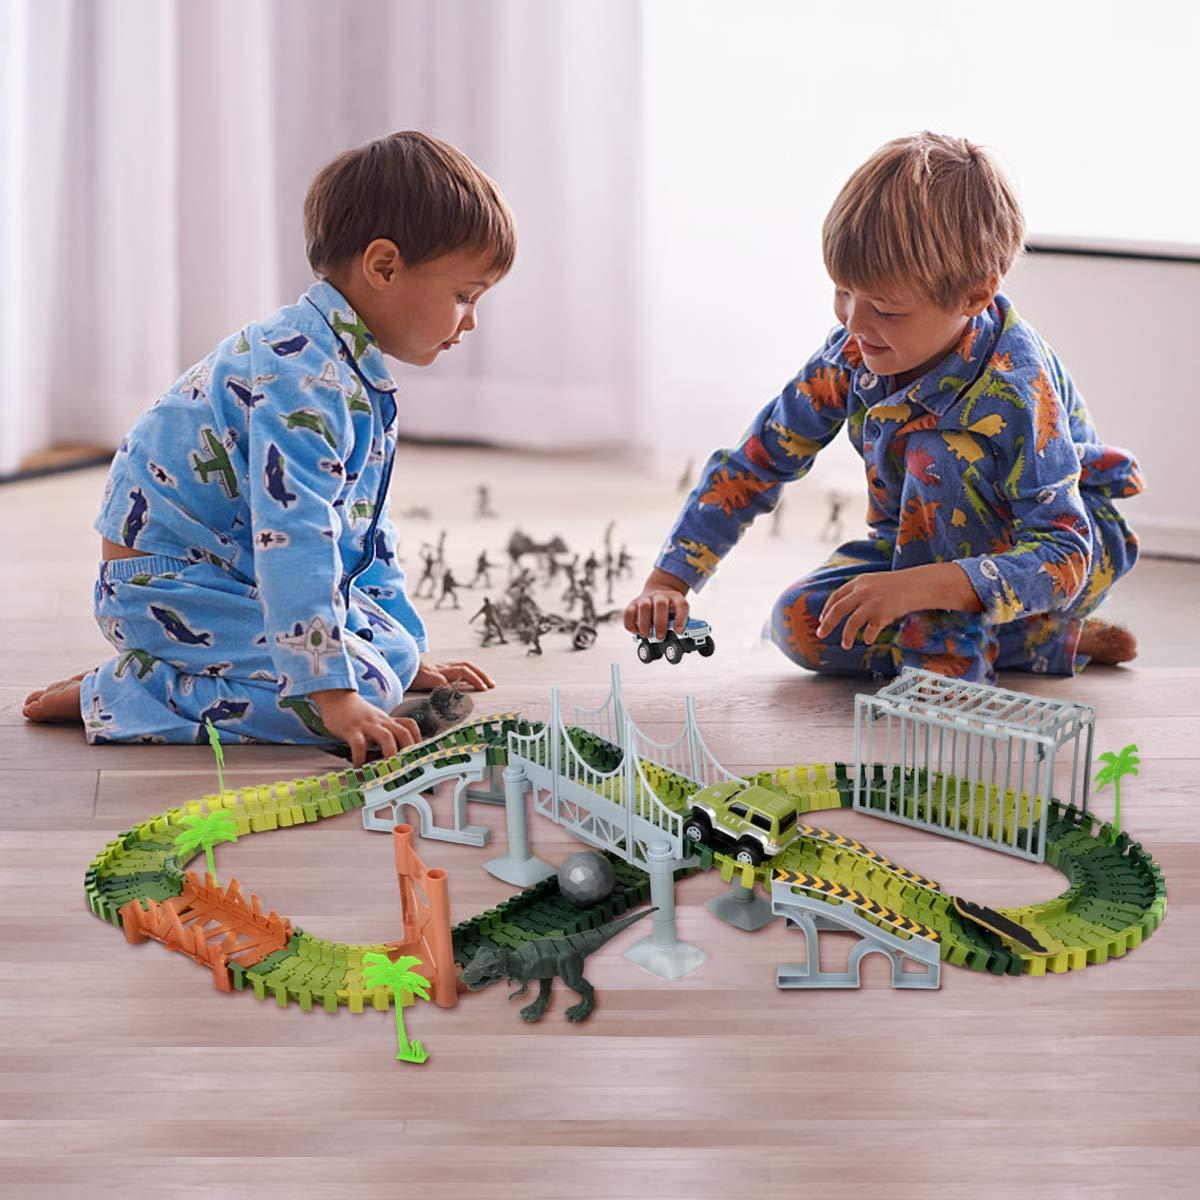 Jurassic Traces De Kidshobby Dinosaures Circuit Jouet Park 76yYbgvf